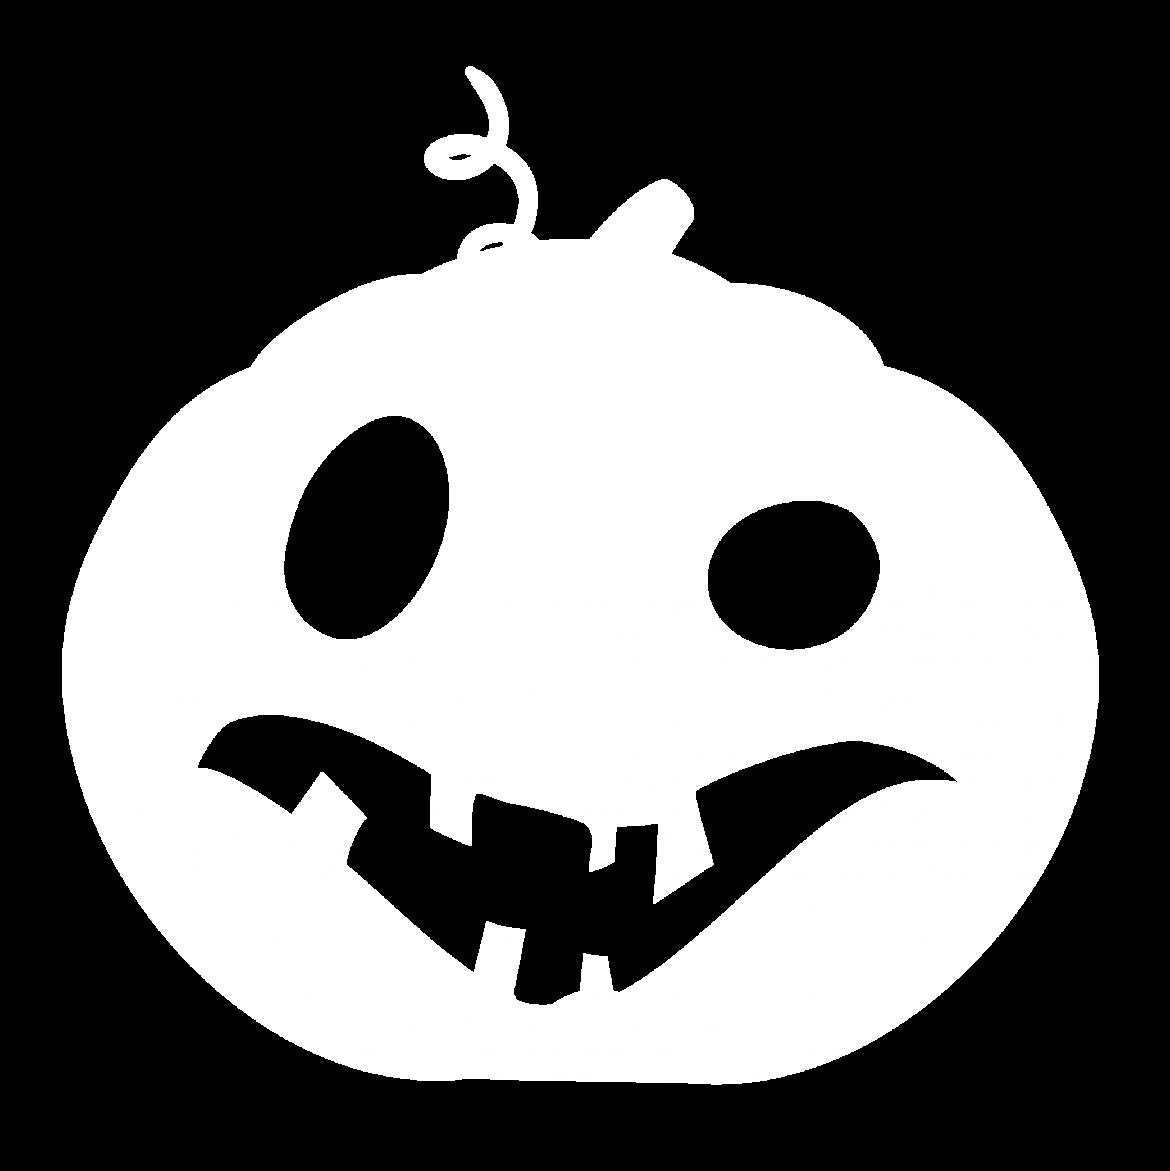 sht_pumpkin4-Converted-01.png